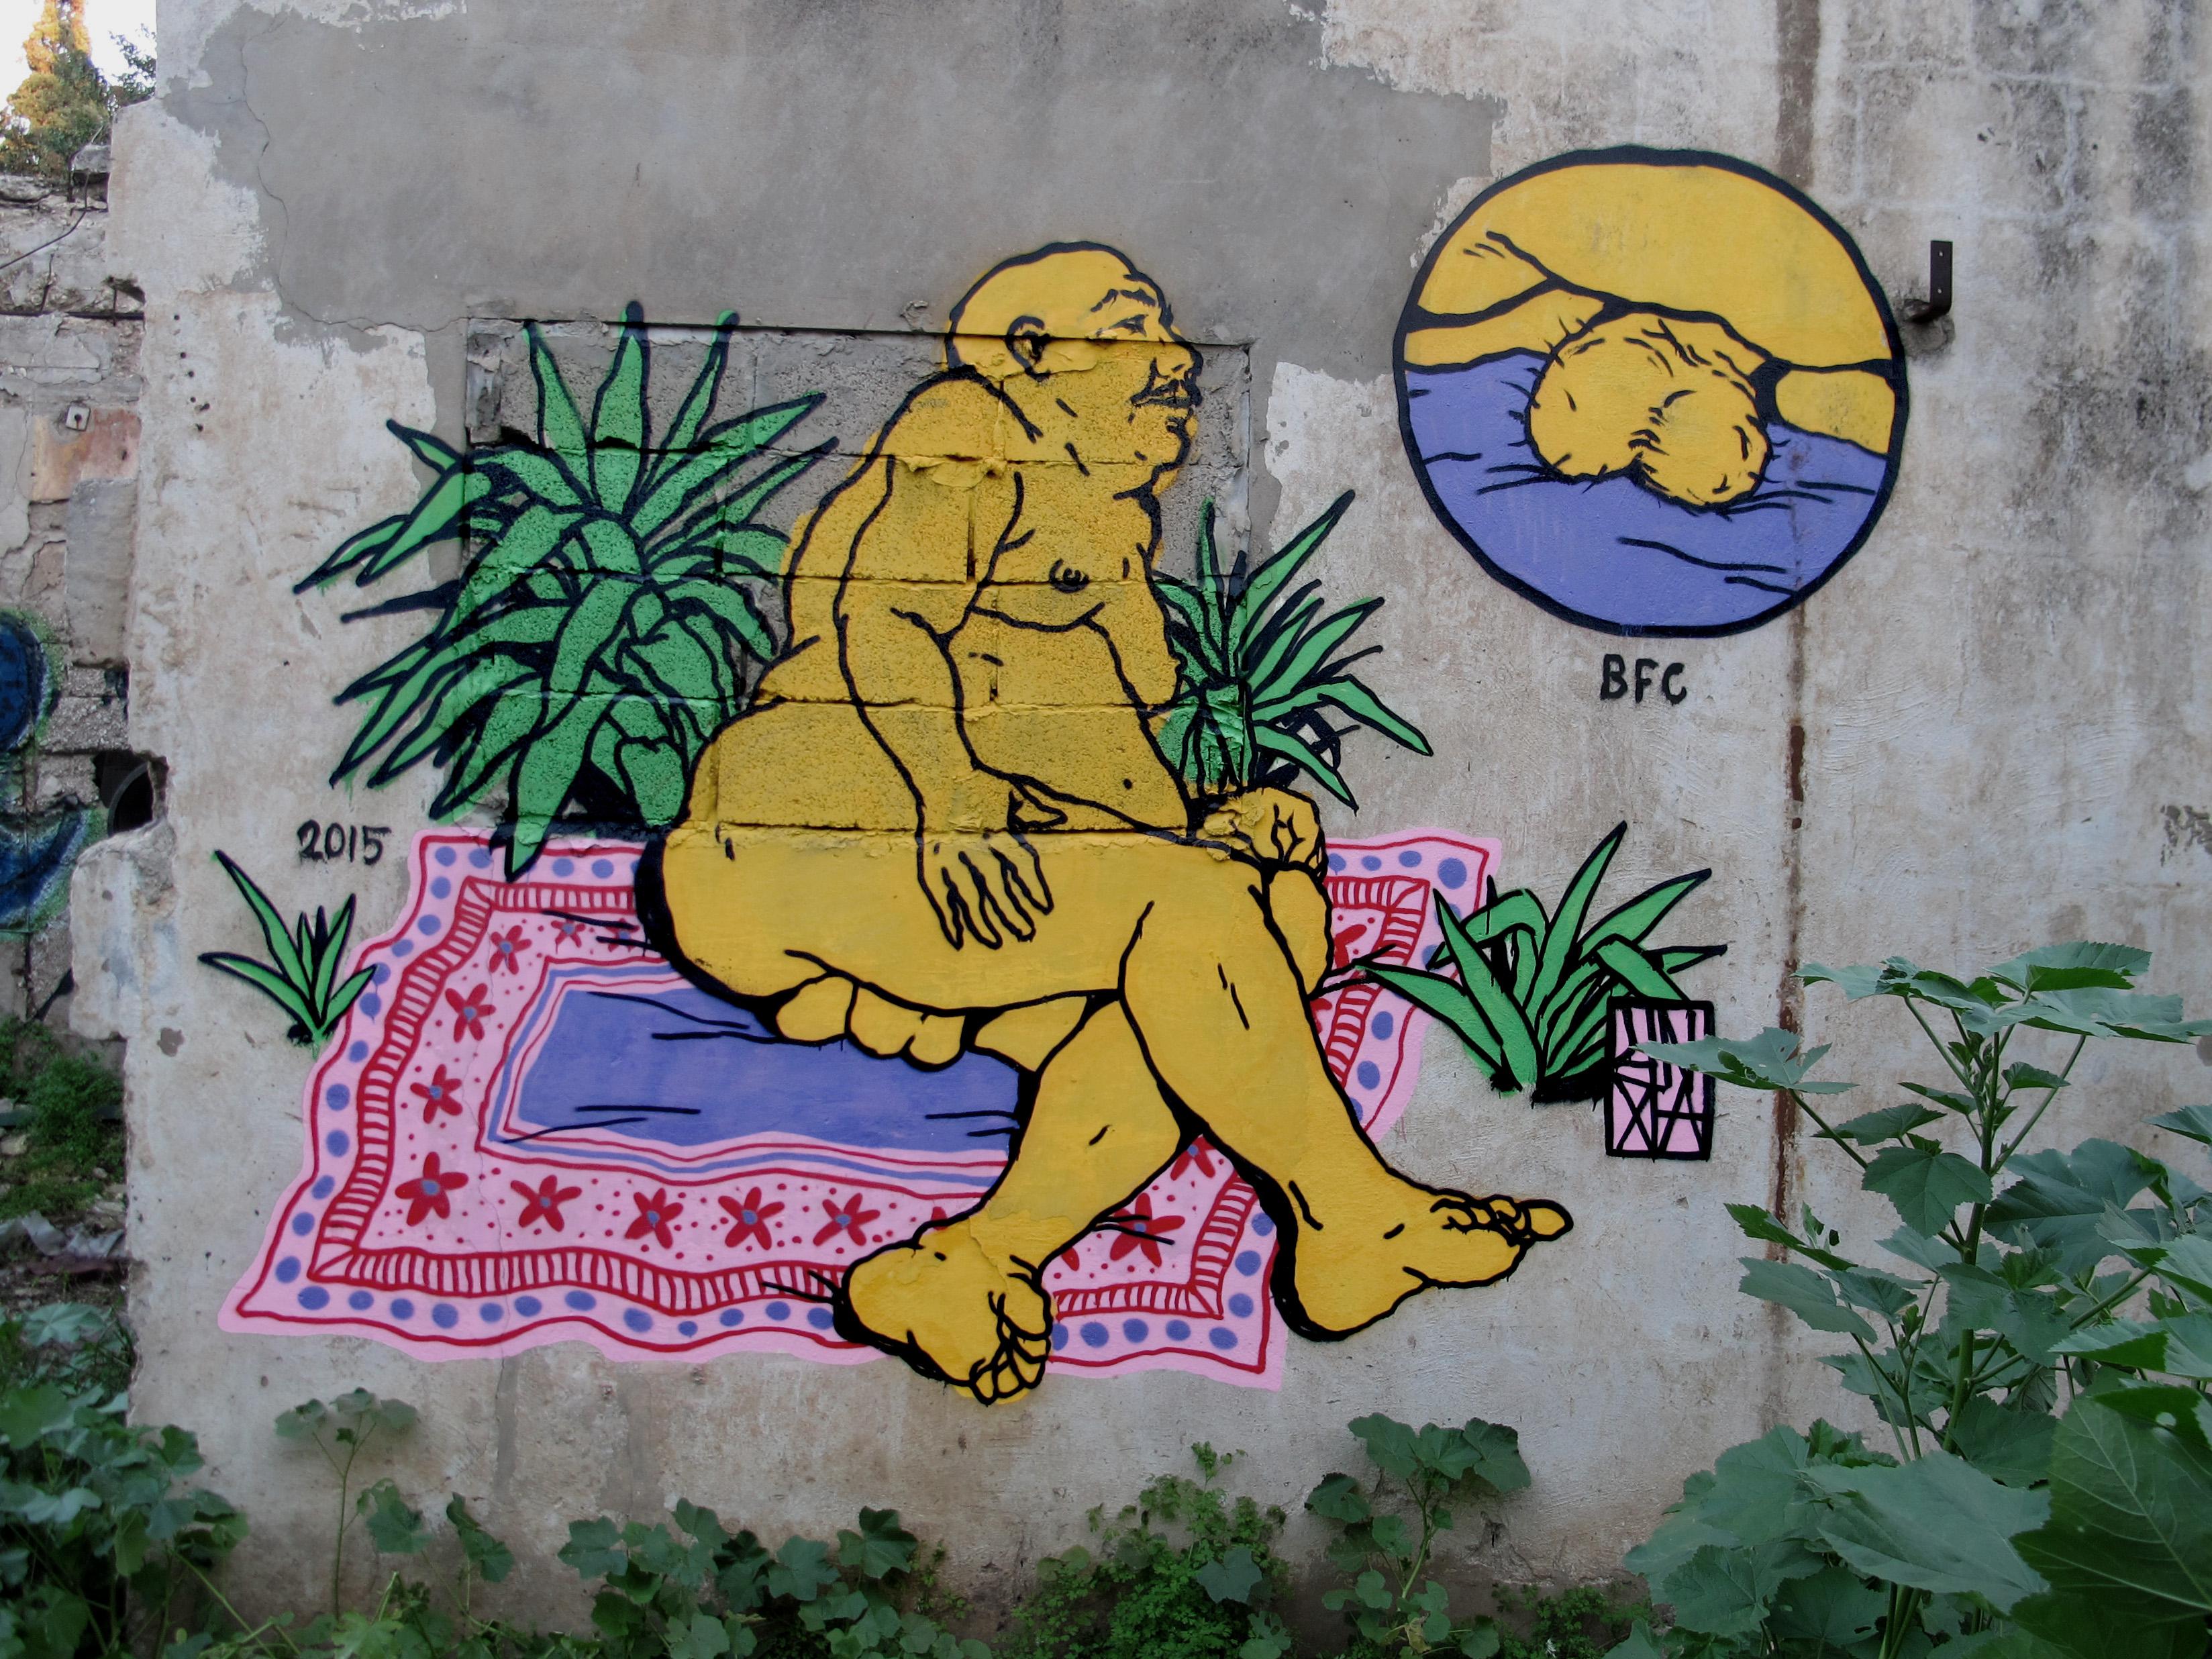 unga broken fingaz graffiti streetart haifa israel bfc fat man balls